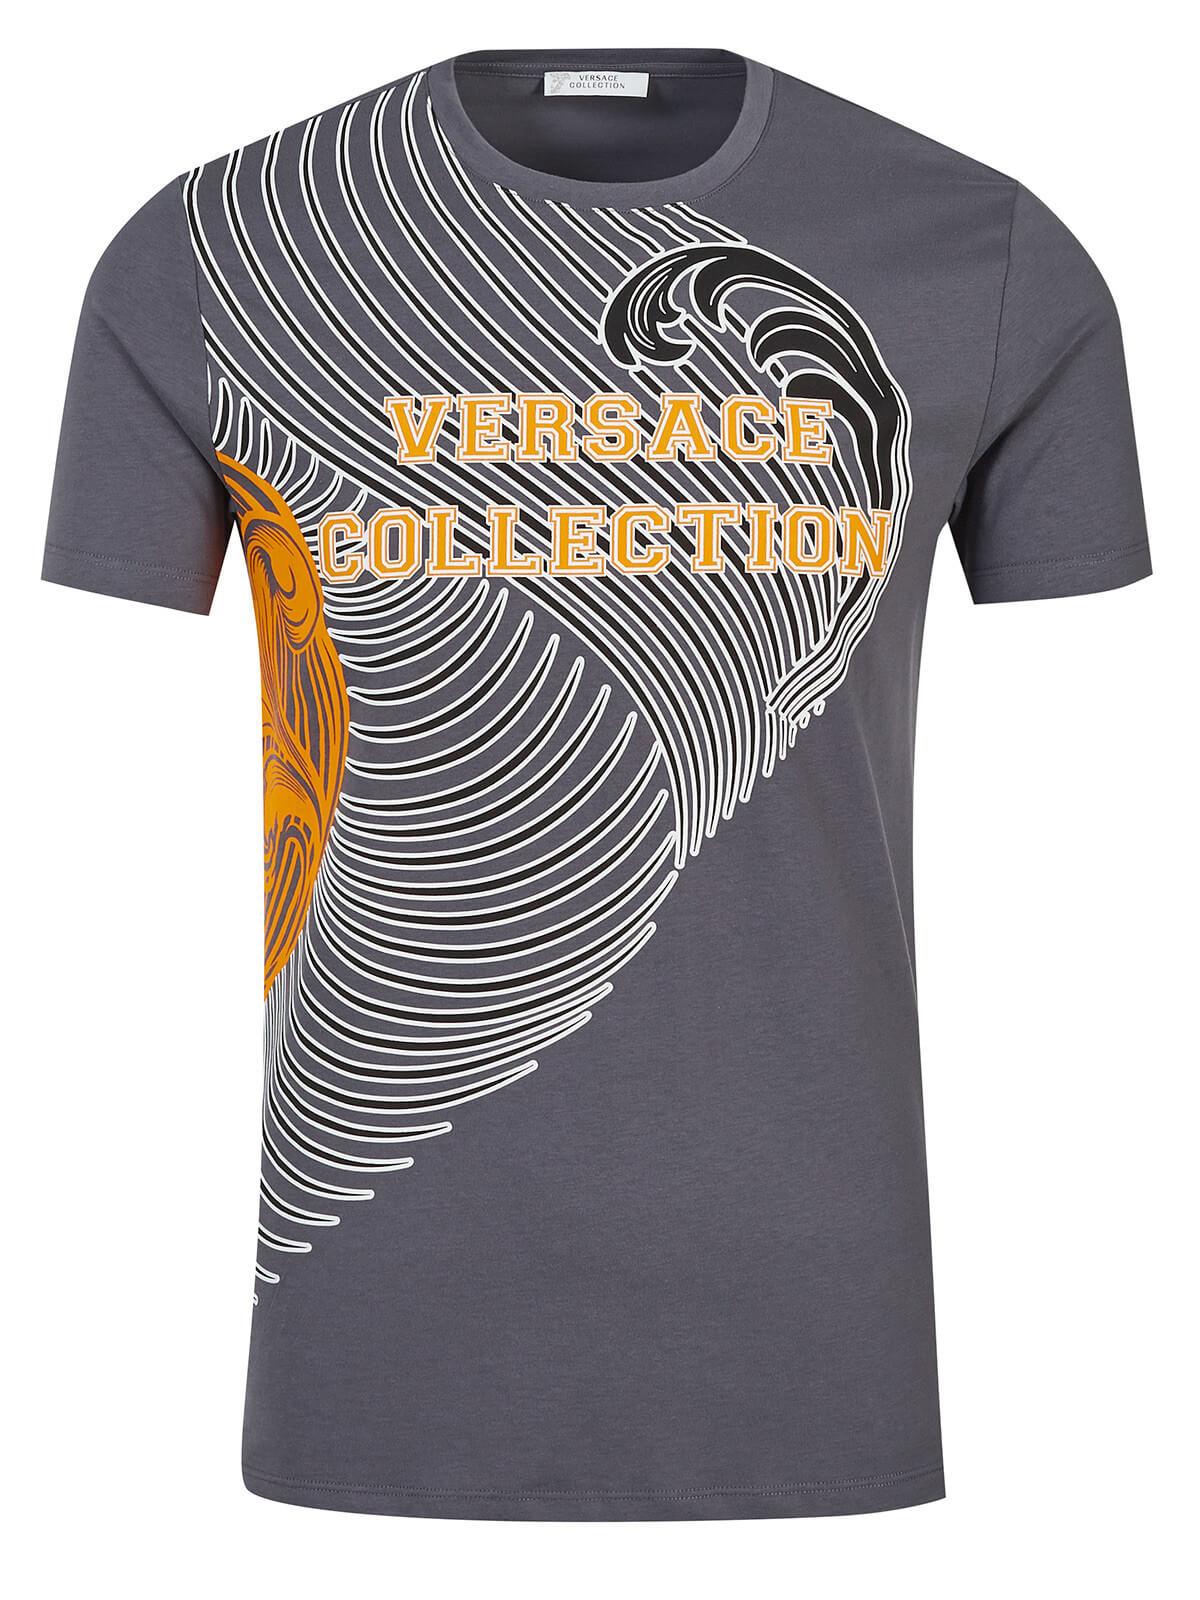 Versace Collection T-Shirt grau  40e0ec41a8